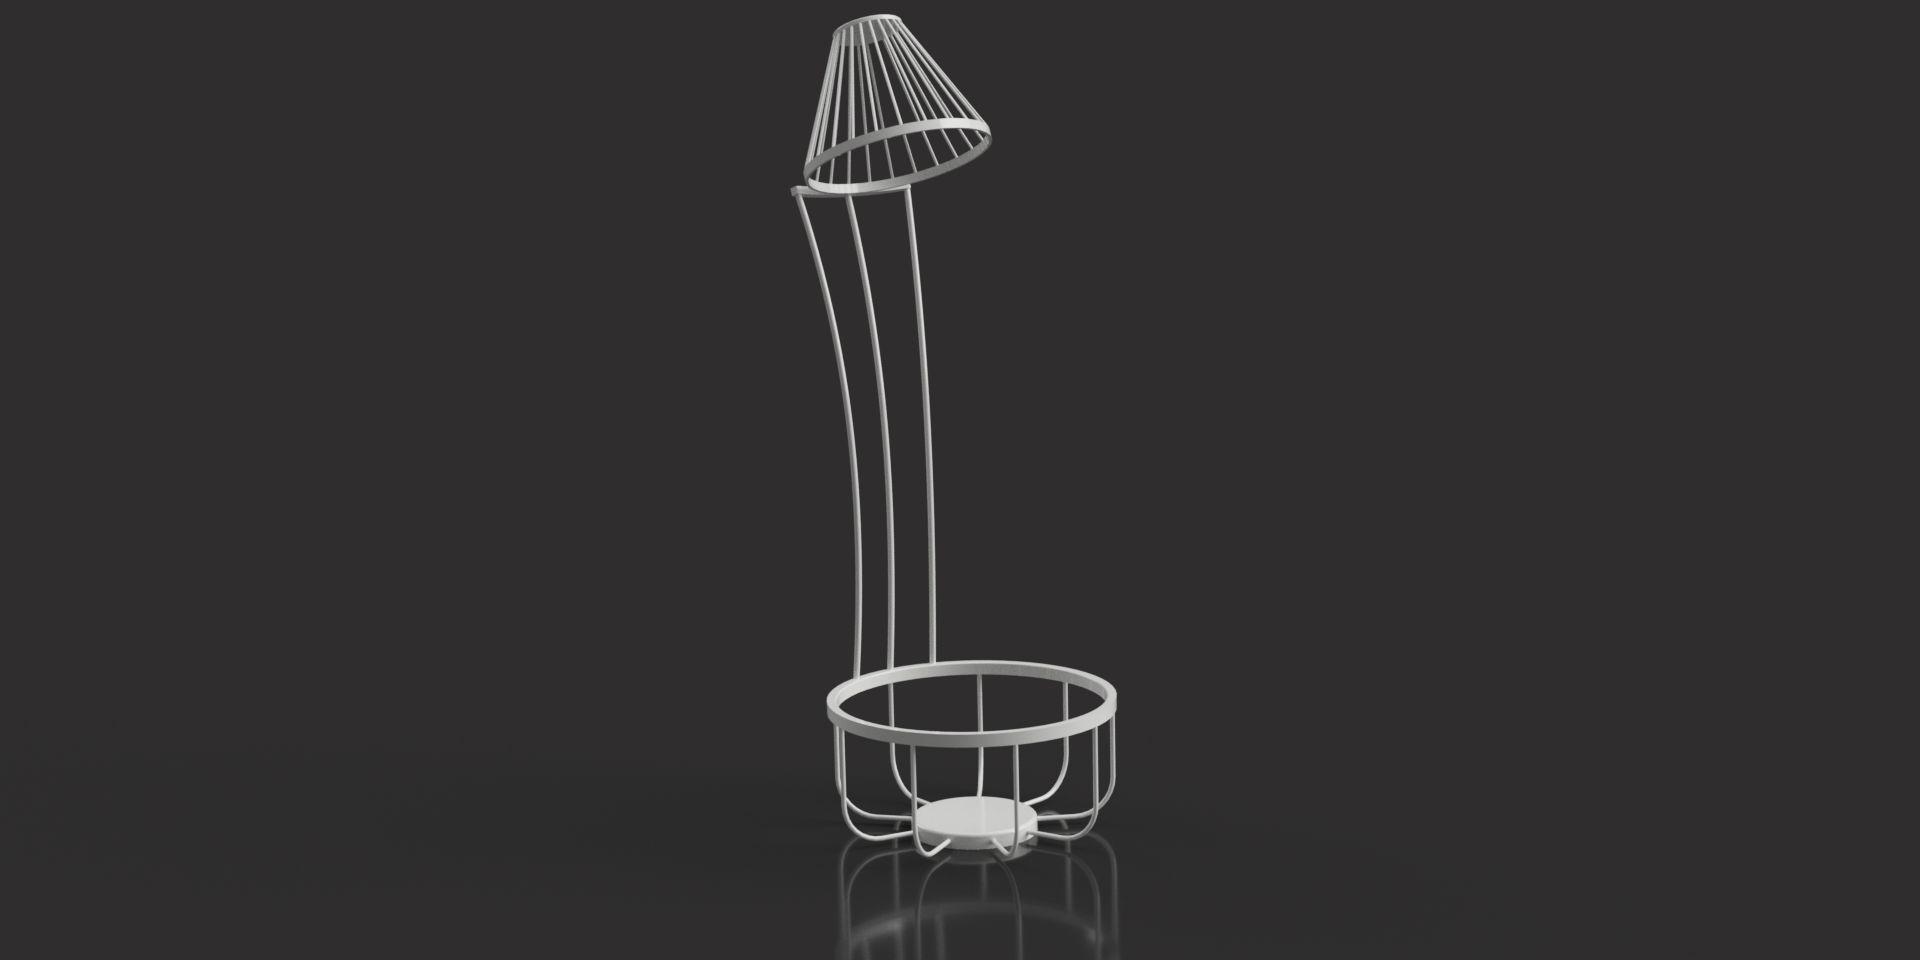 Lumini-apple-v1-3500-3500